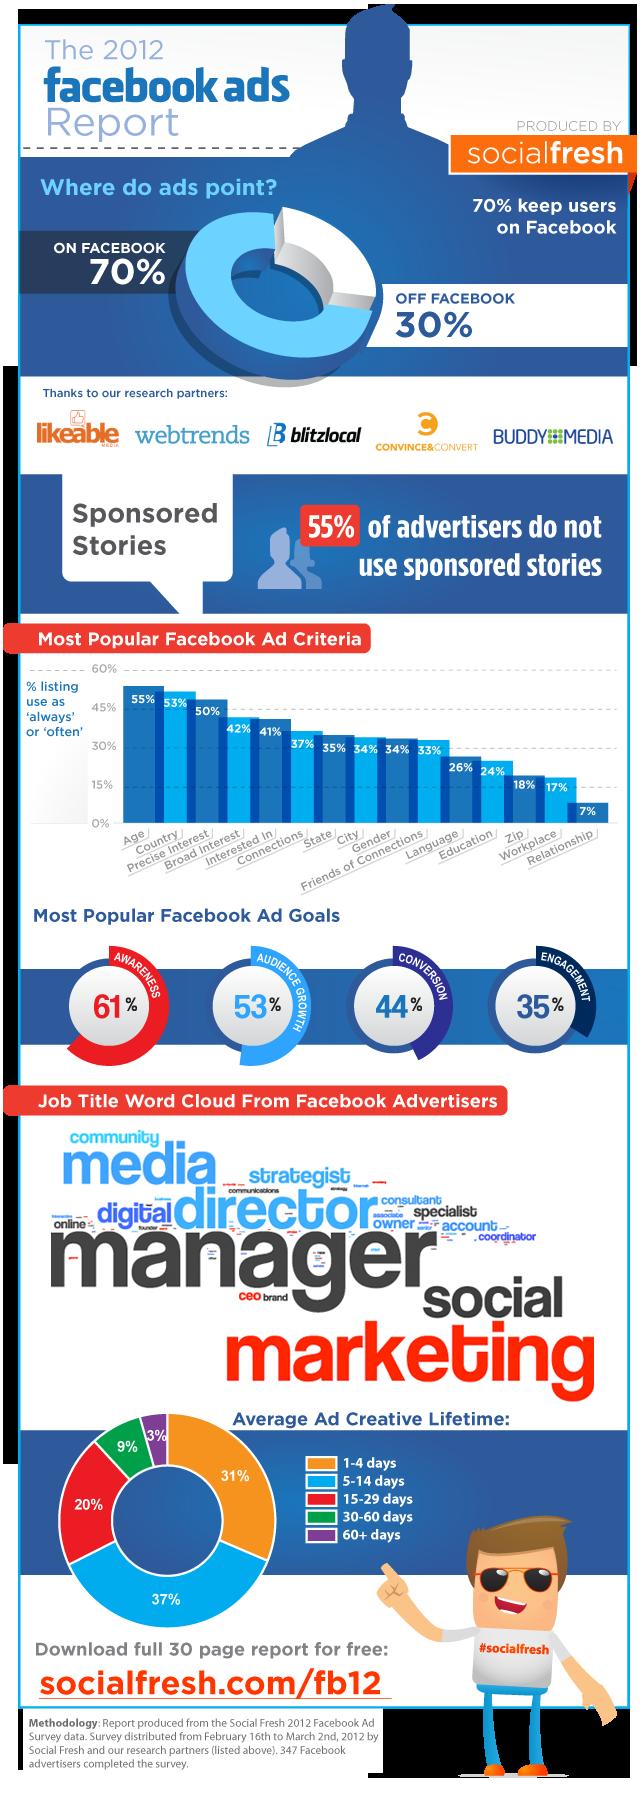 Ecco i risultati del #Facebook #Advertising Report 2012 in #infografica!